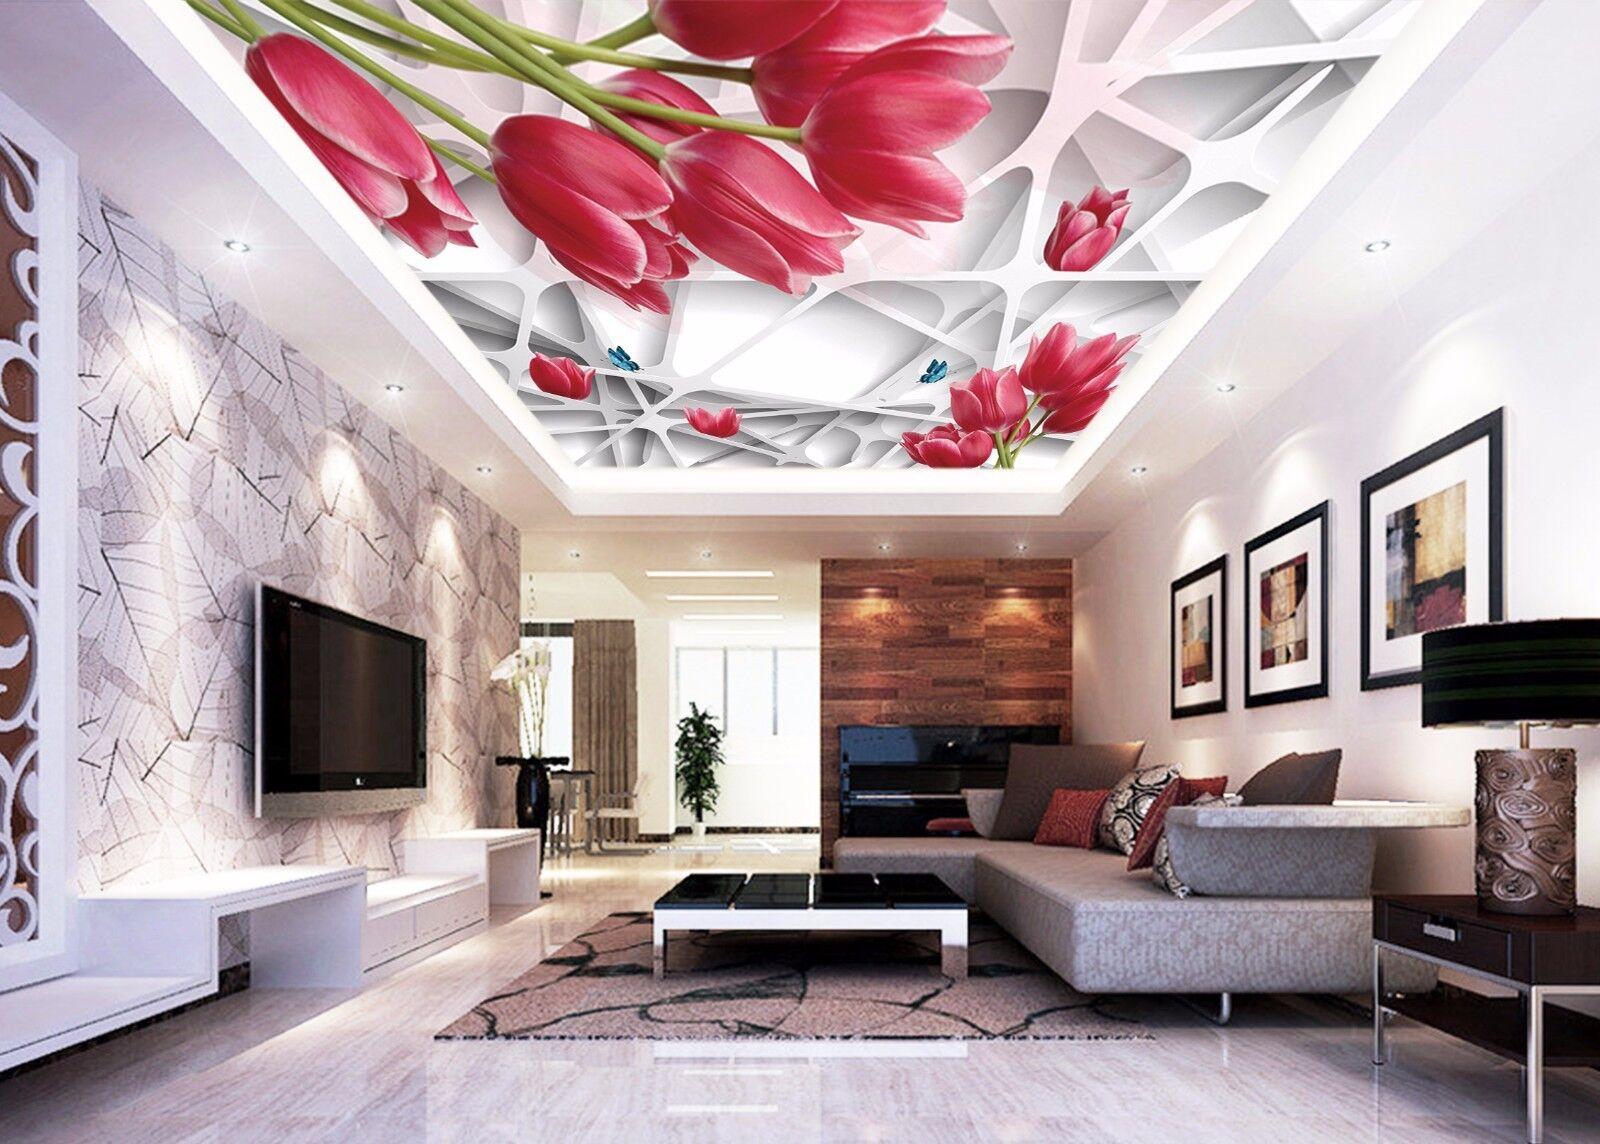 3D Red Tulips 743 Ceiling WallPaper Murals Wall Print Decal Deco AJ WALLPAPER GB